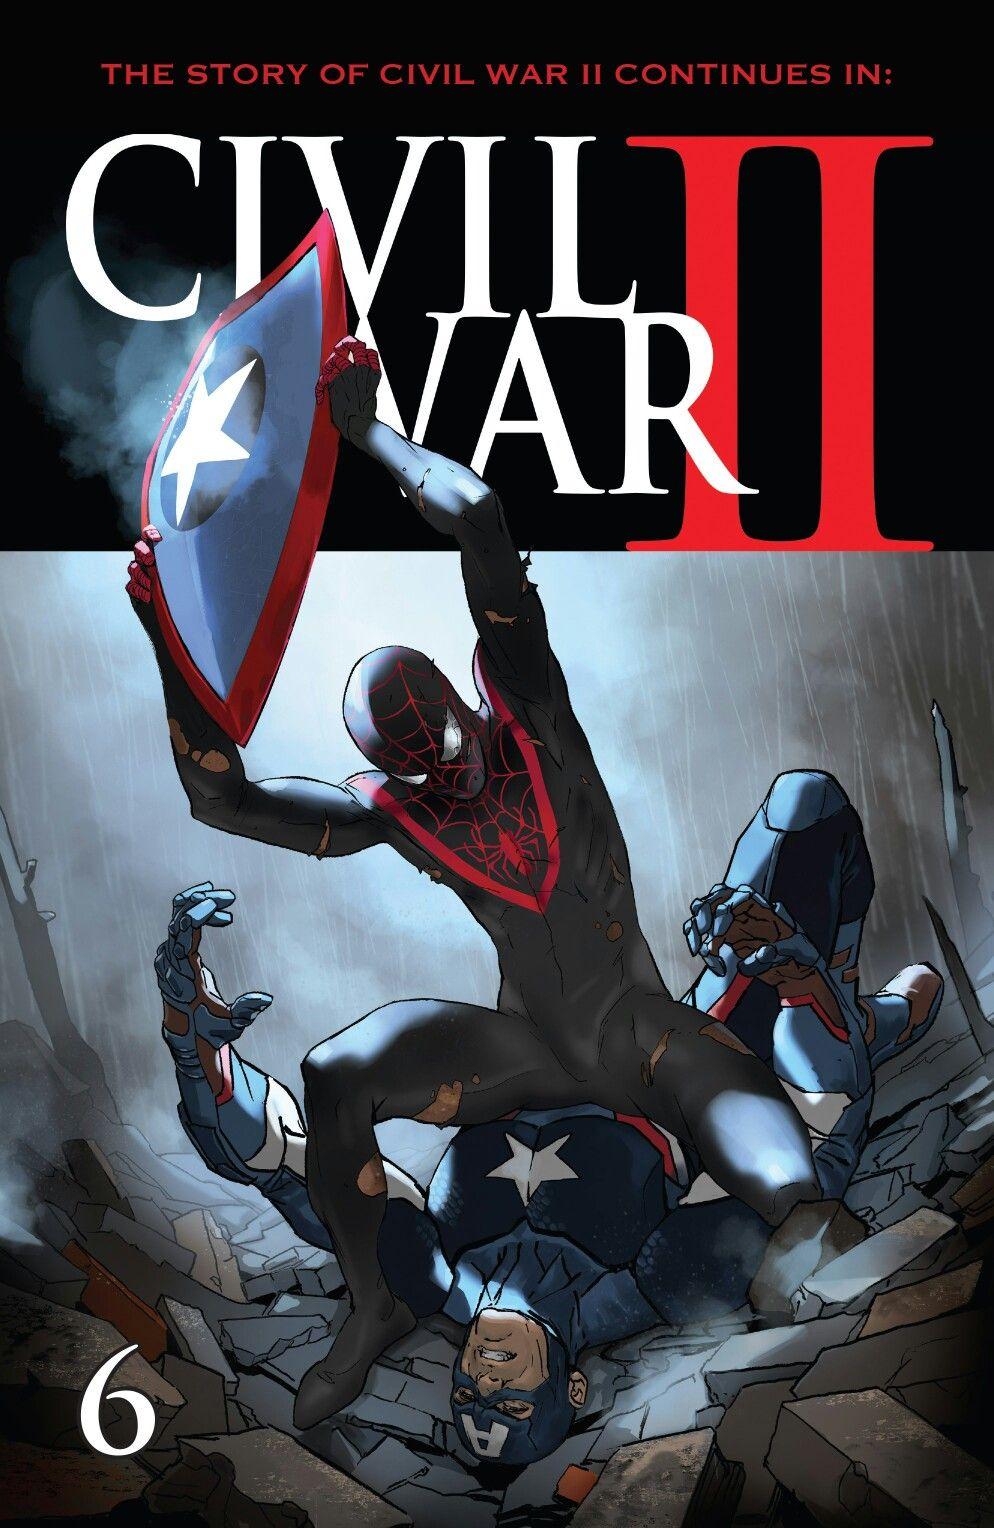 spiderman vs captain america civil war uperhero pinterest captain america civil war. Black Bedroom Furniture Sets. Home Design Ideas